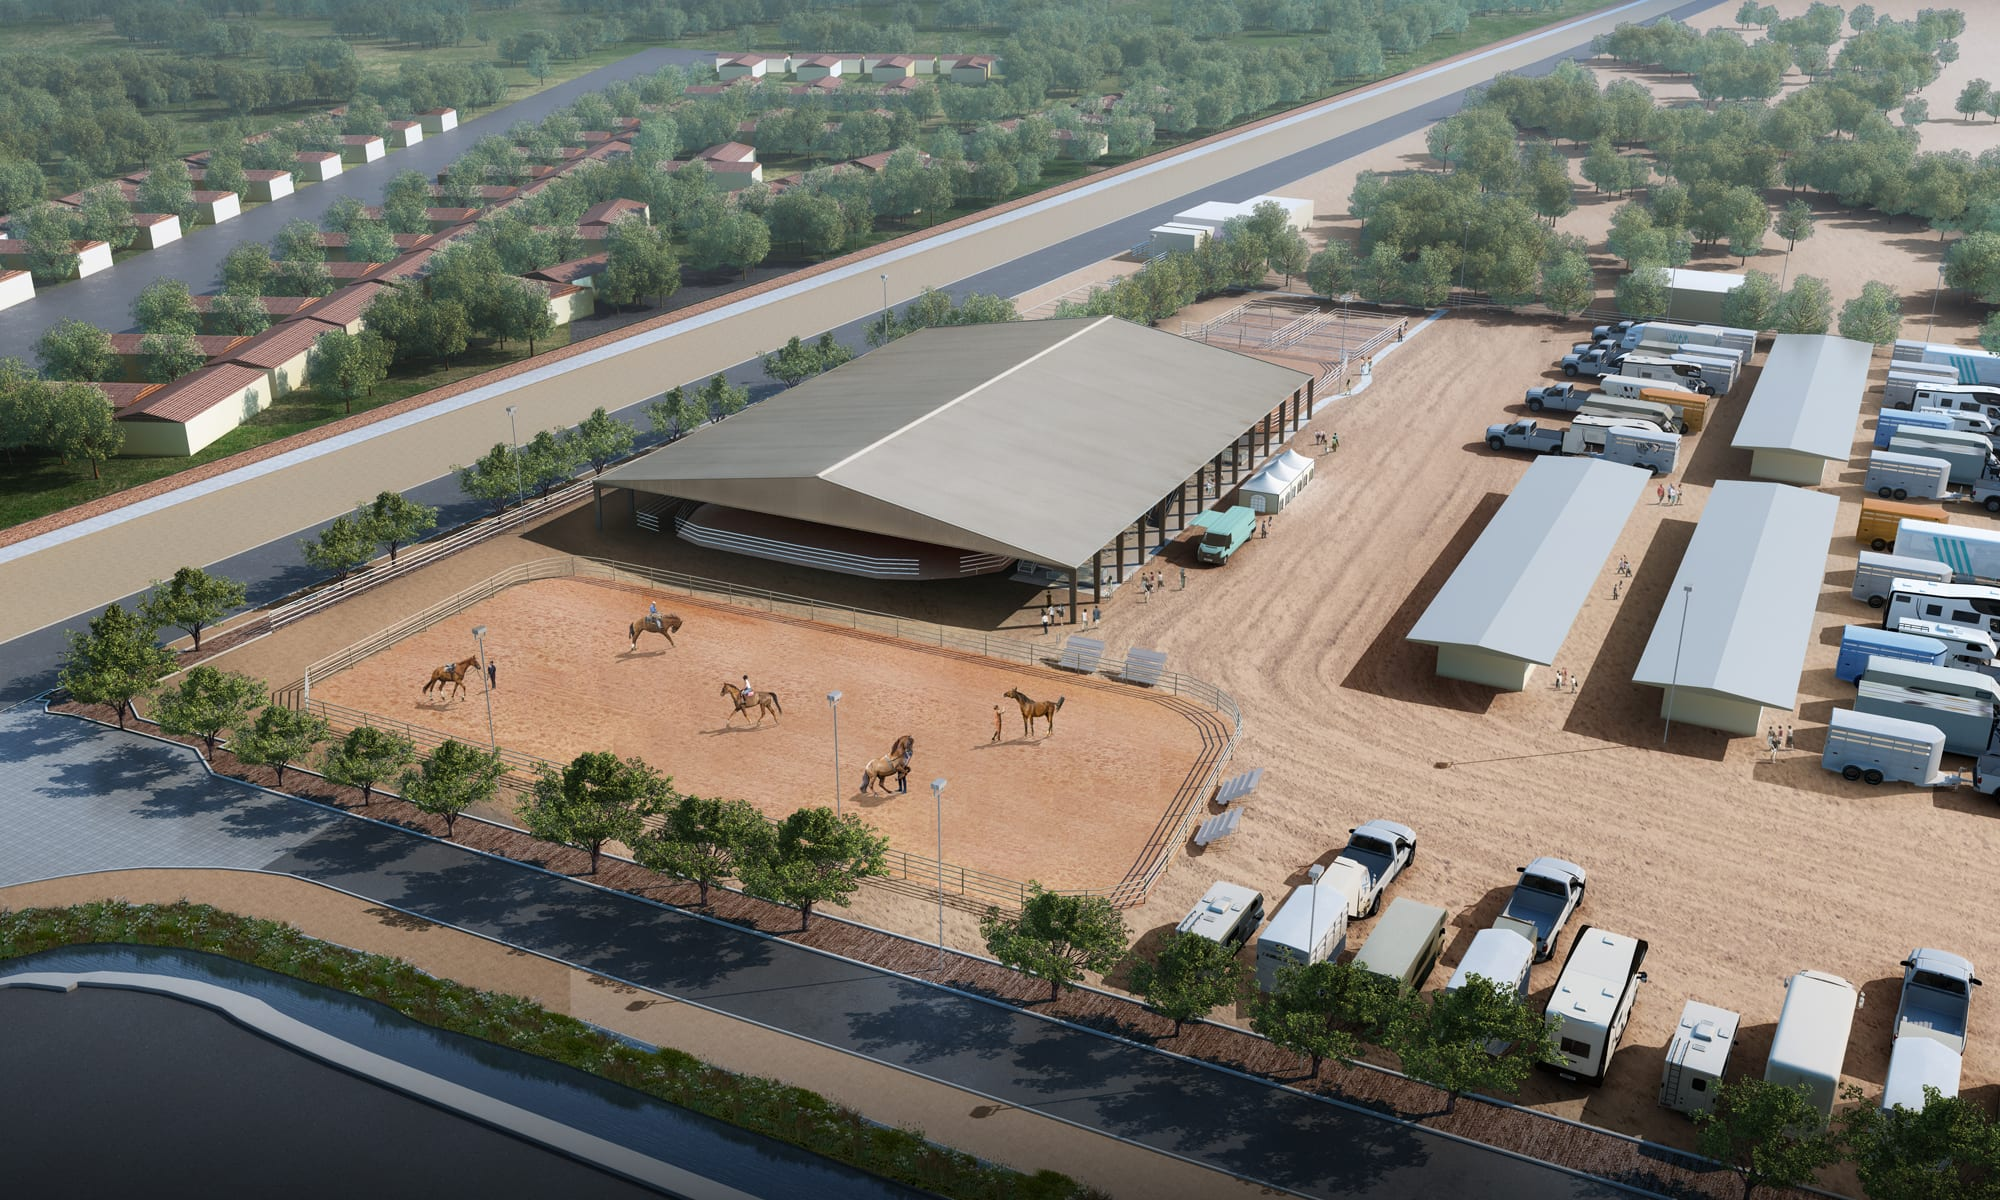 Horsemans Park New Flamingo arena Aerial